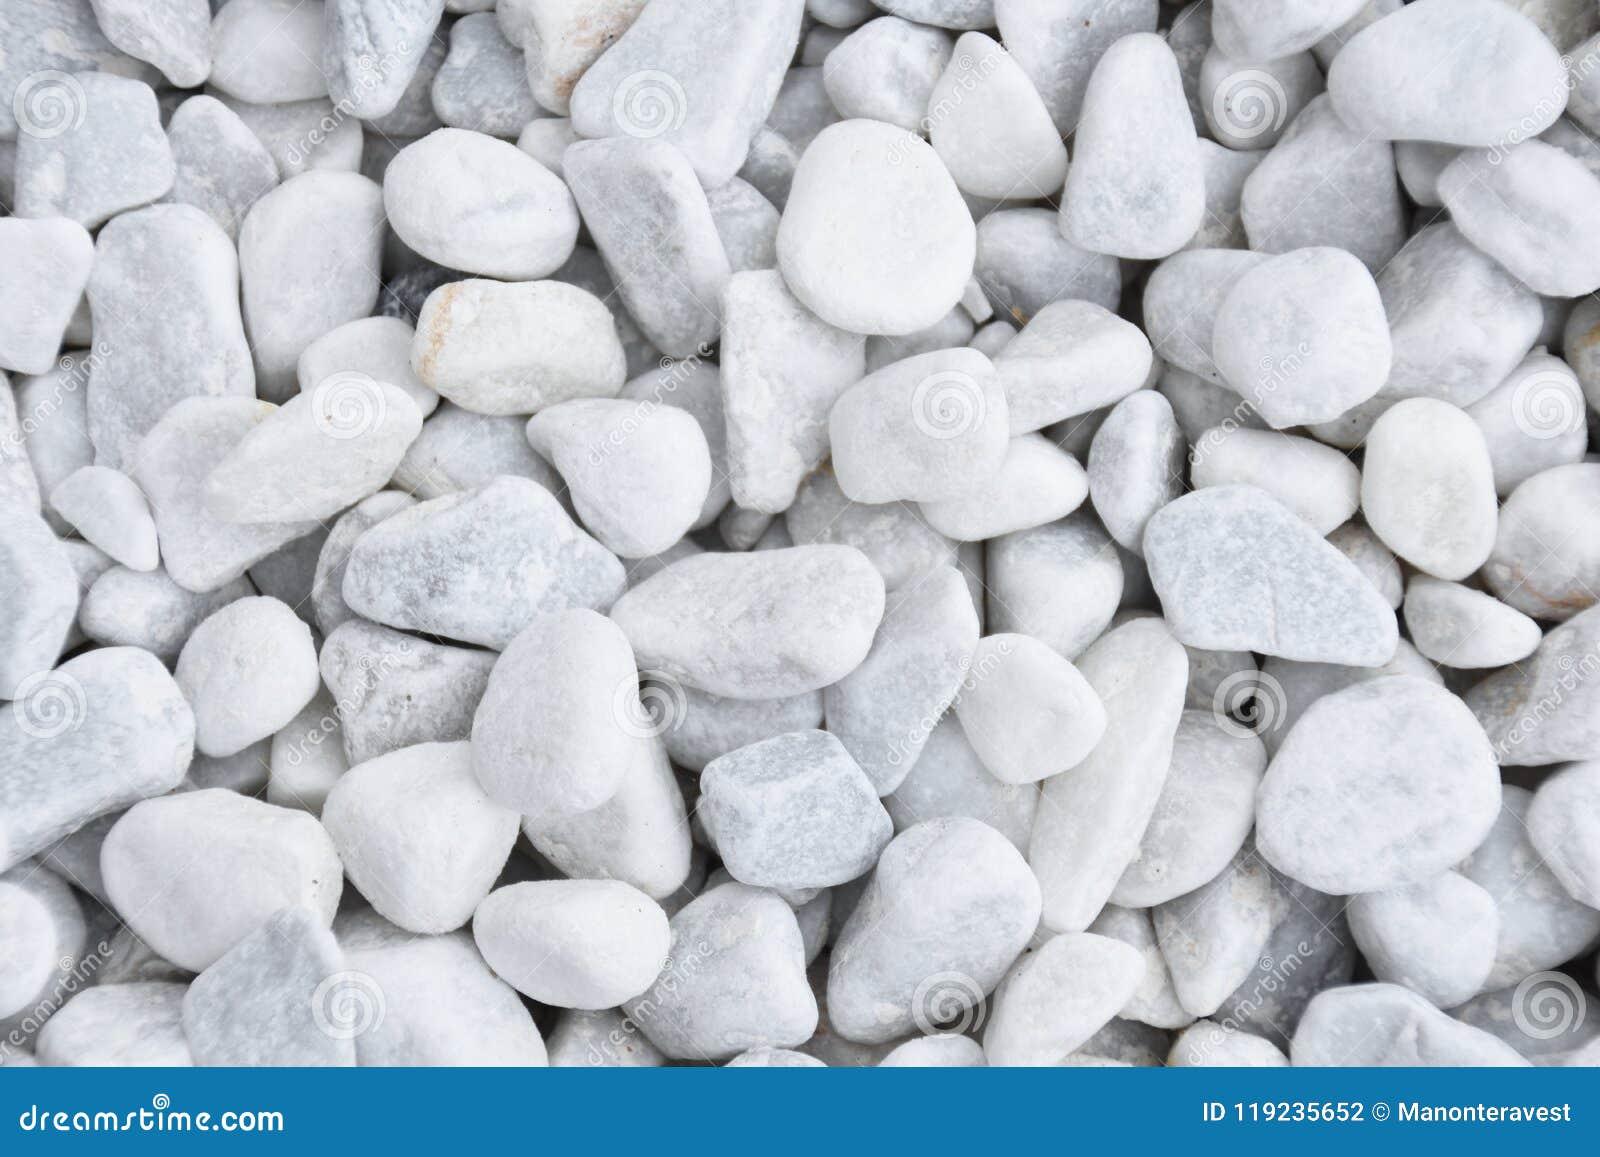 Close Up White Garden Stones. Decorative Gravel.